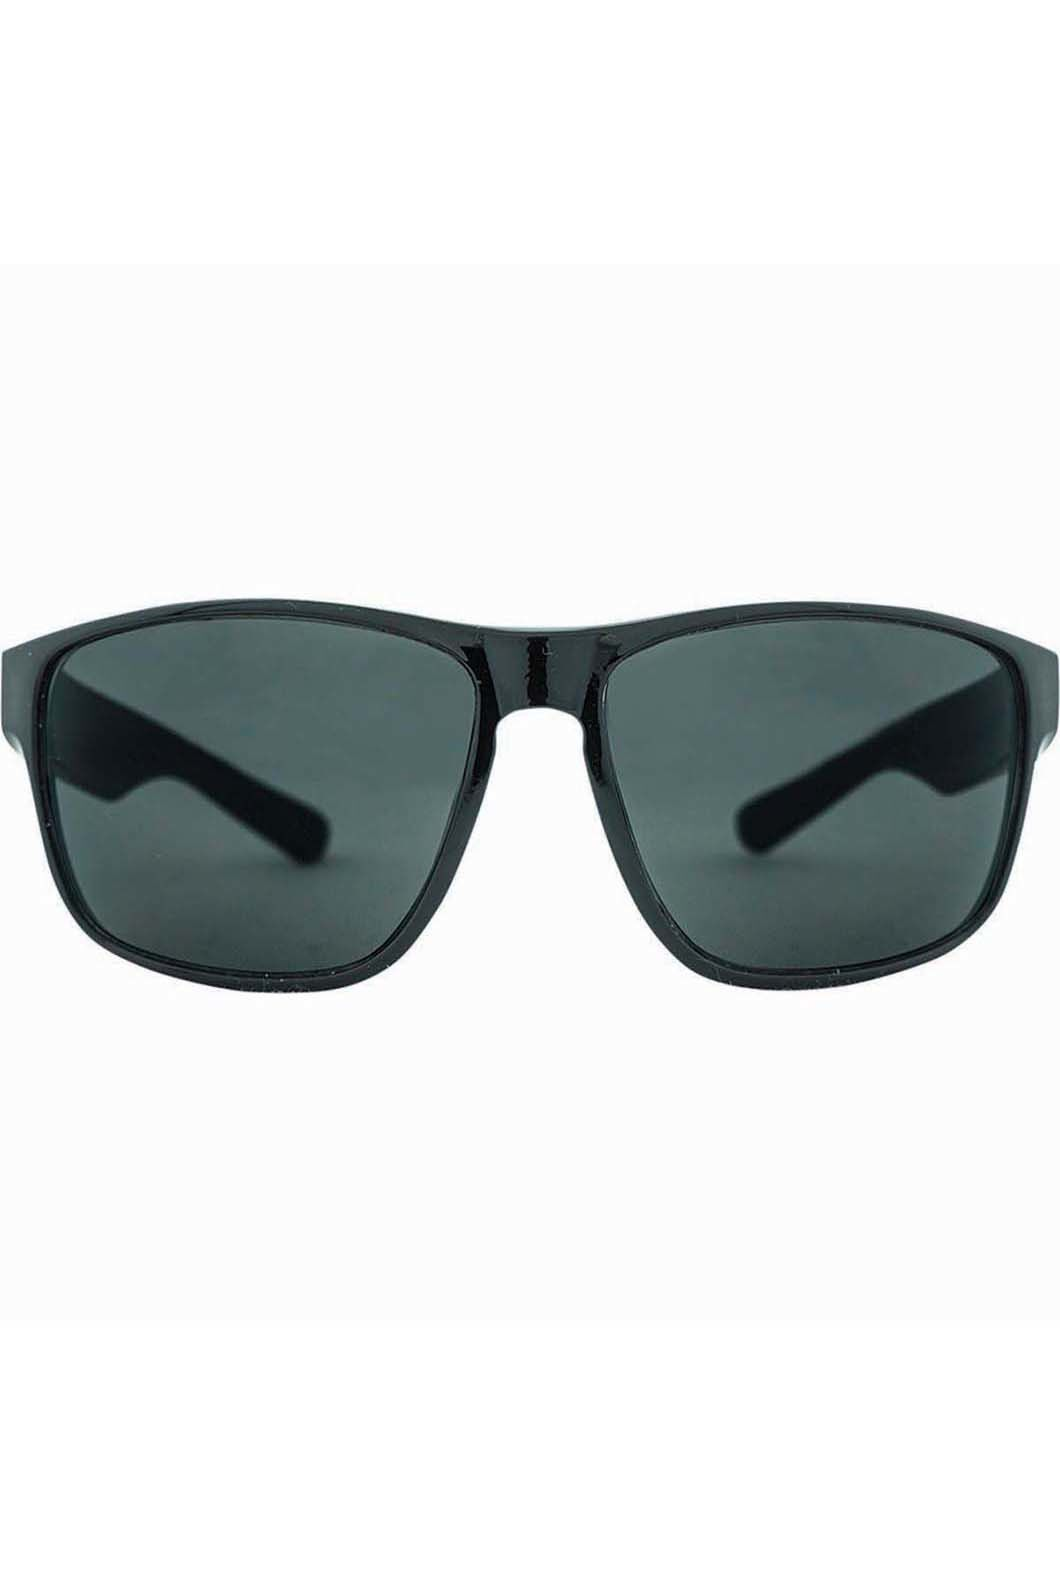 Venture Eyewear Men's Summit Sunglasses DemiG15, Black/Grey, hi-res